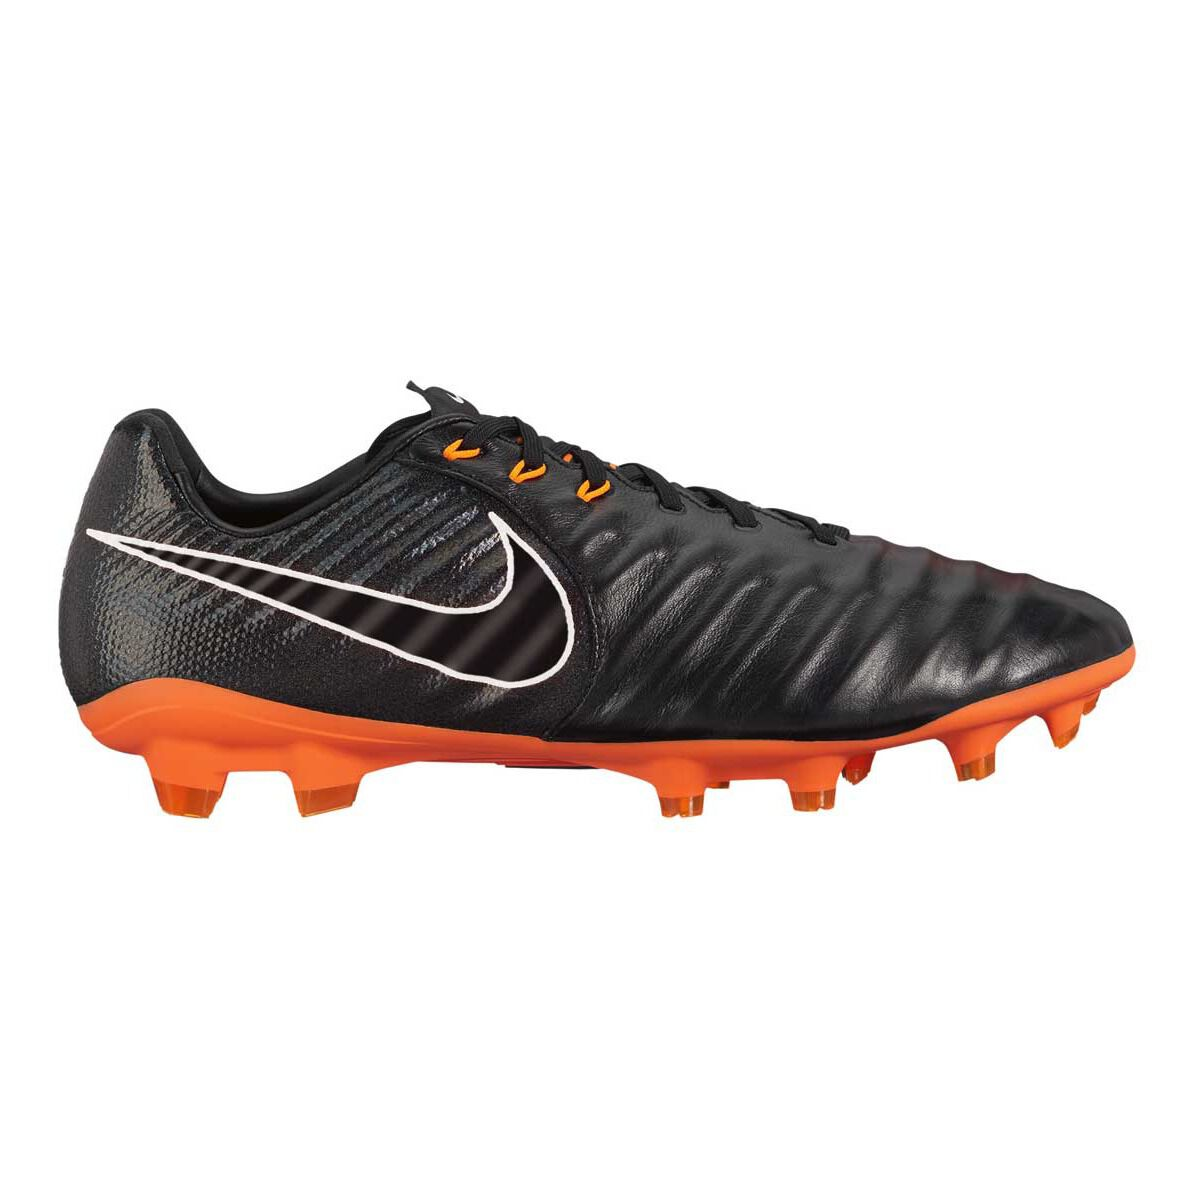 9cb7cea4a9 ... where can i buy nike tiempo legend vii pro fg mens football boots black  orange us